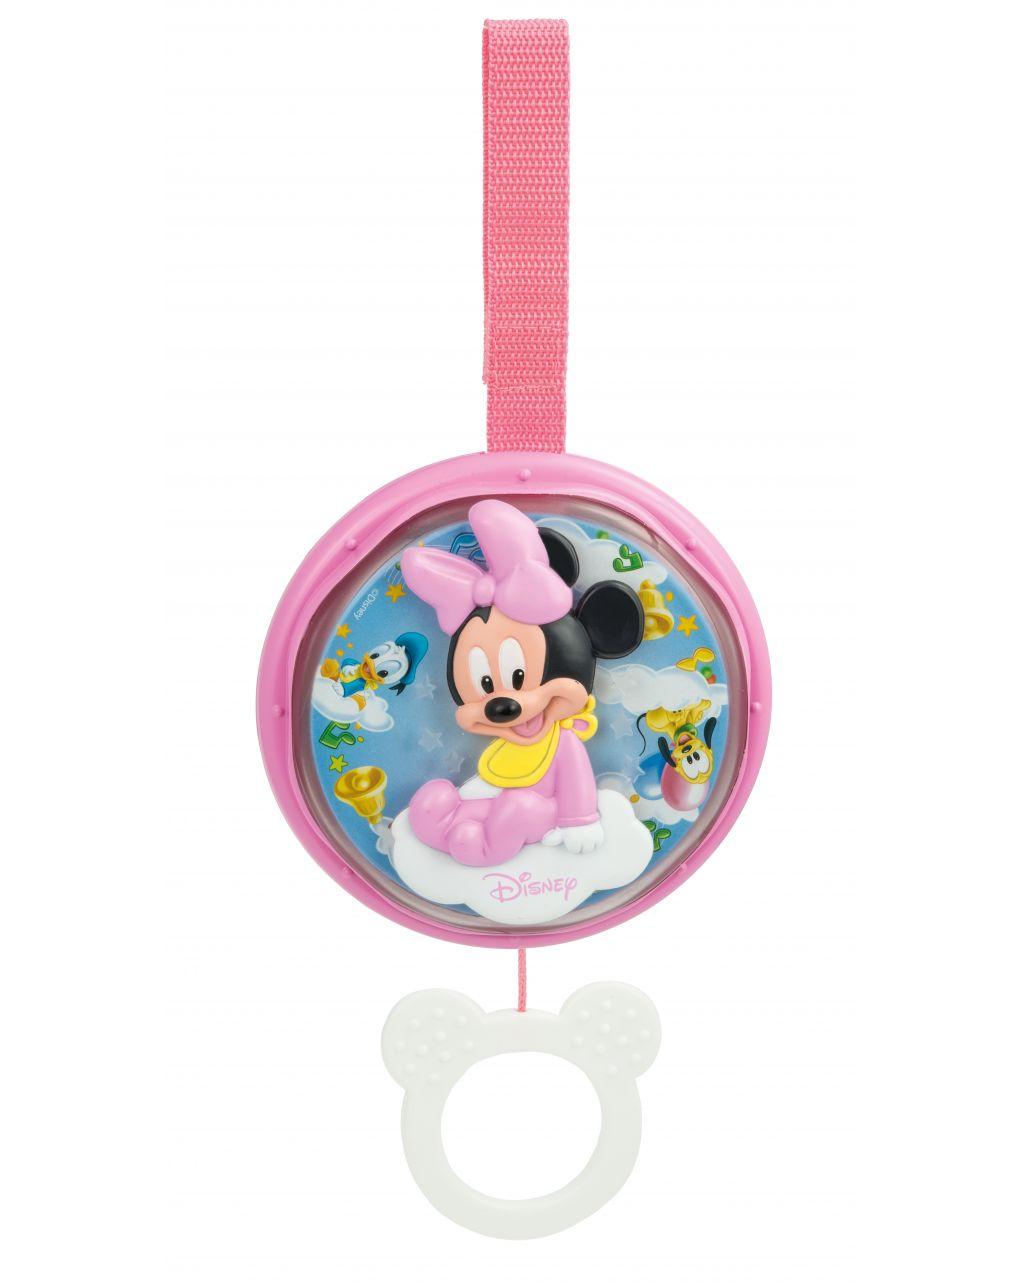 Disney baby - minnie carillon dolce notte - Clementoni